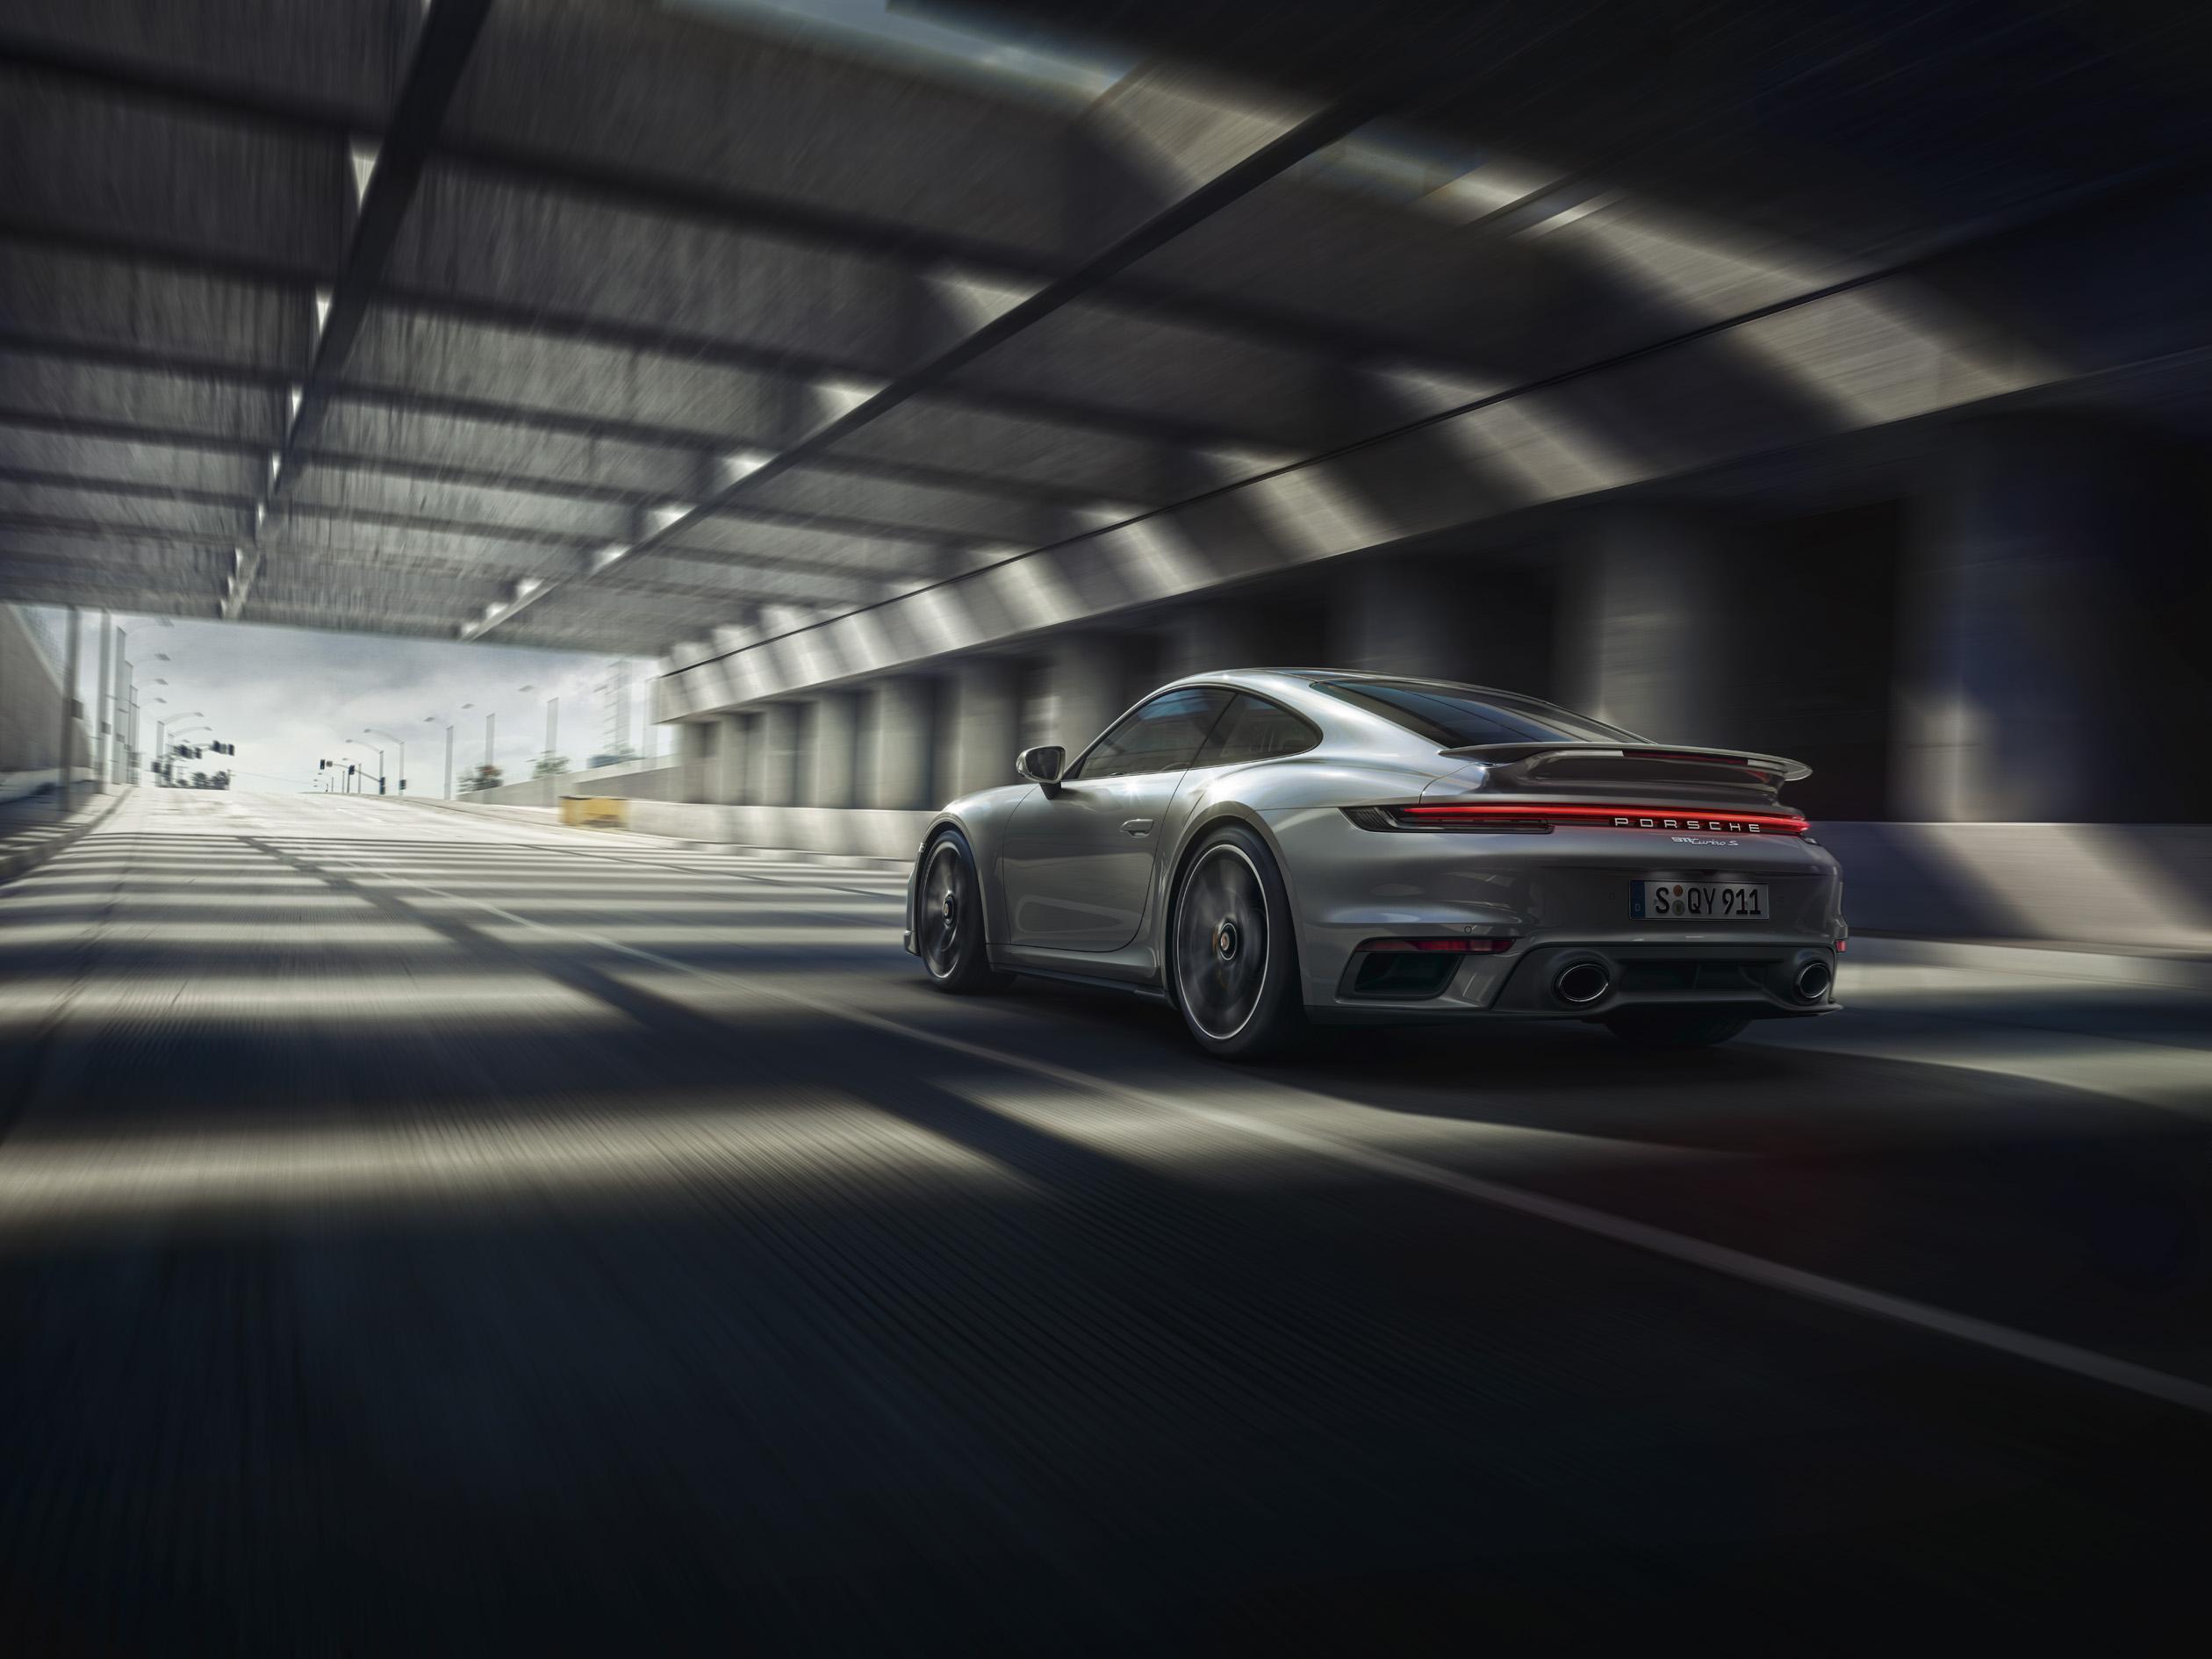 Porsche 911 Turbo S [3]